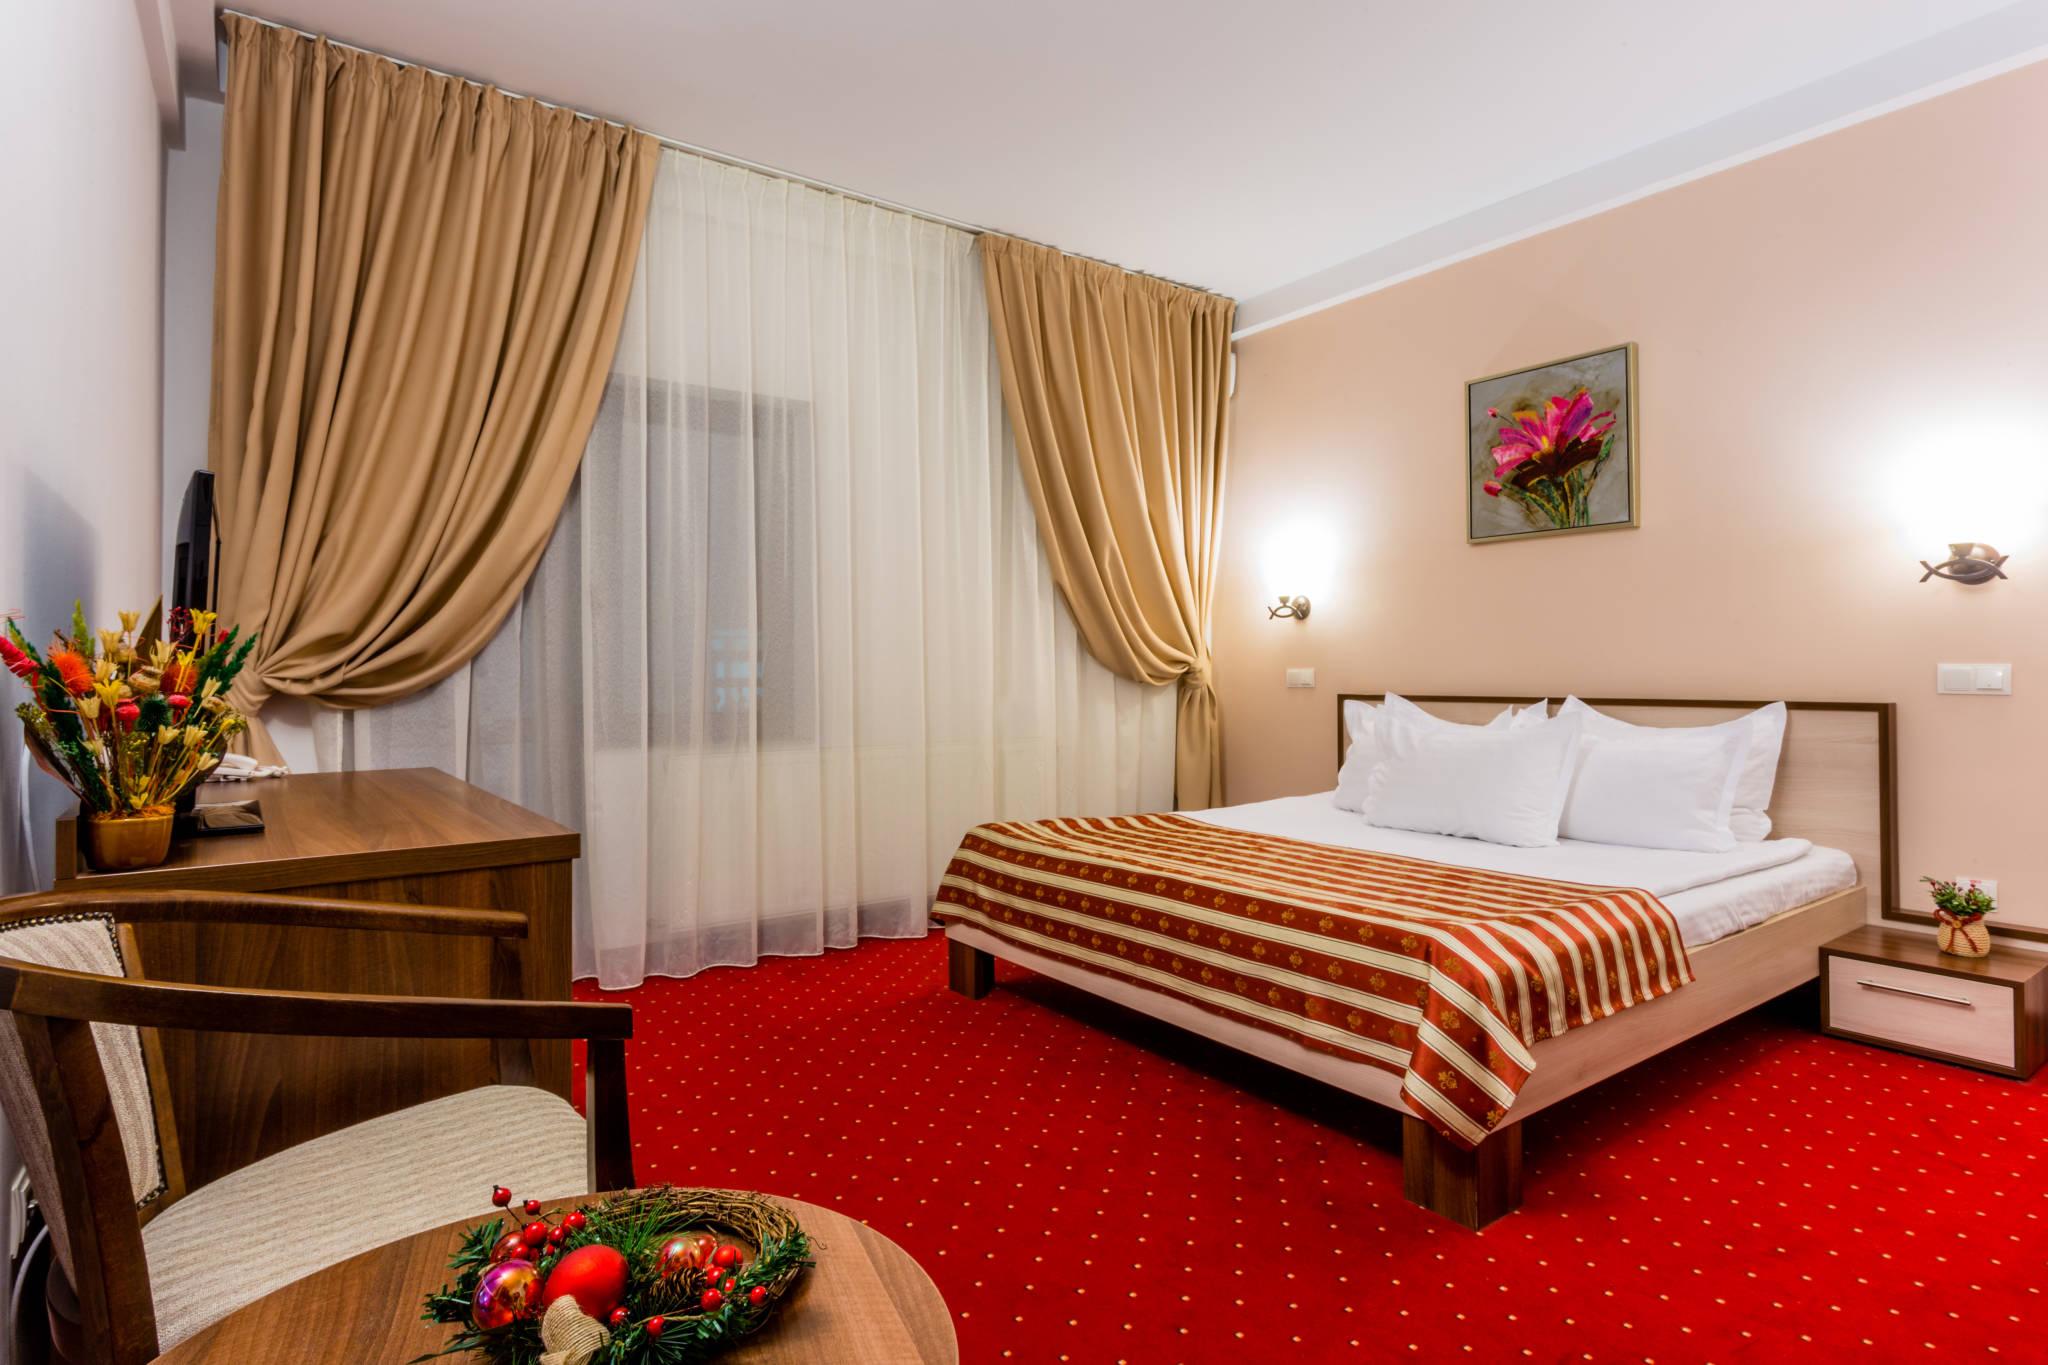 Hotel Stefani - room photo 10875474